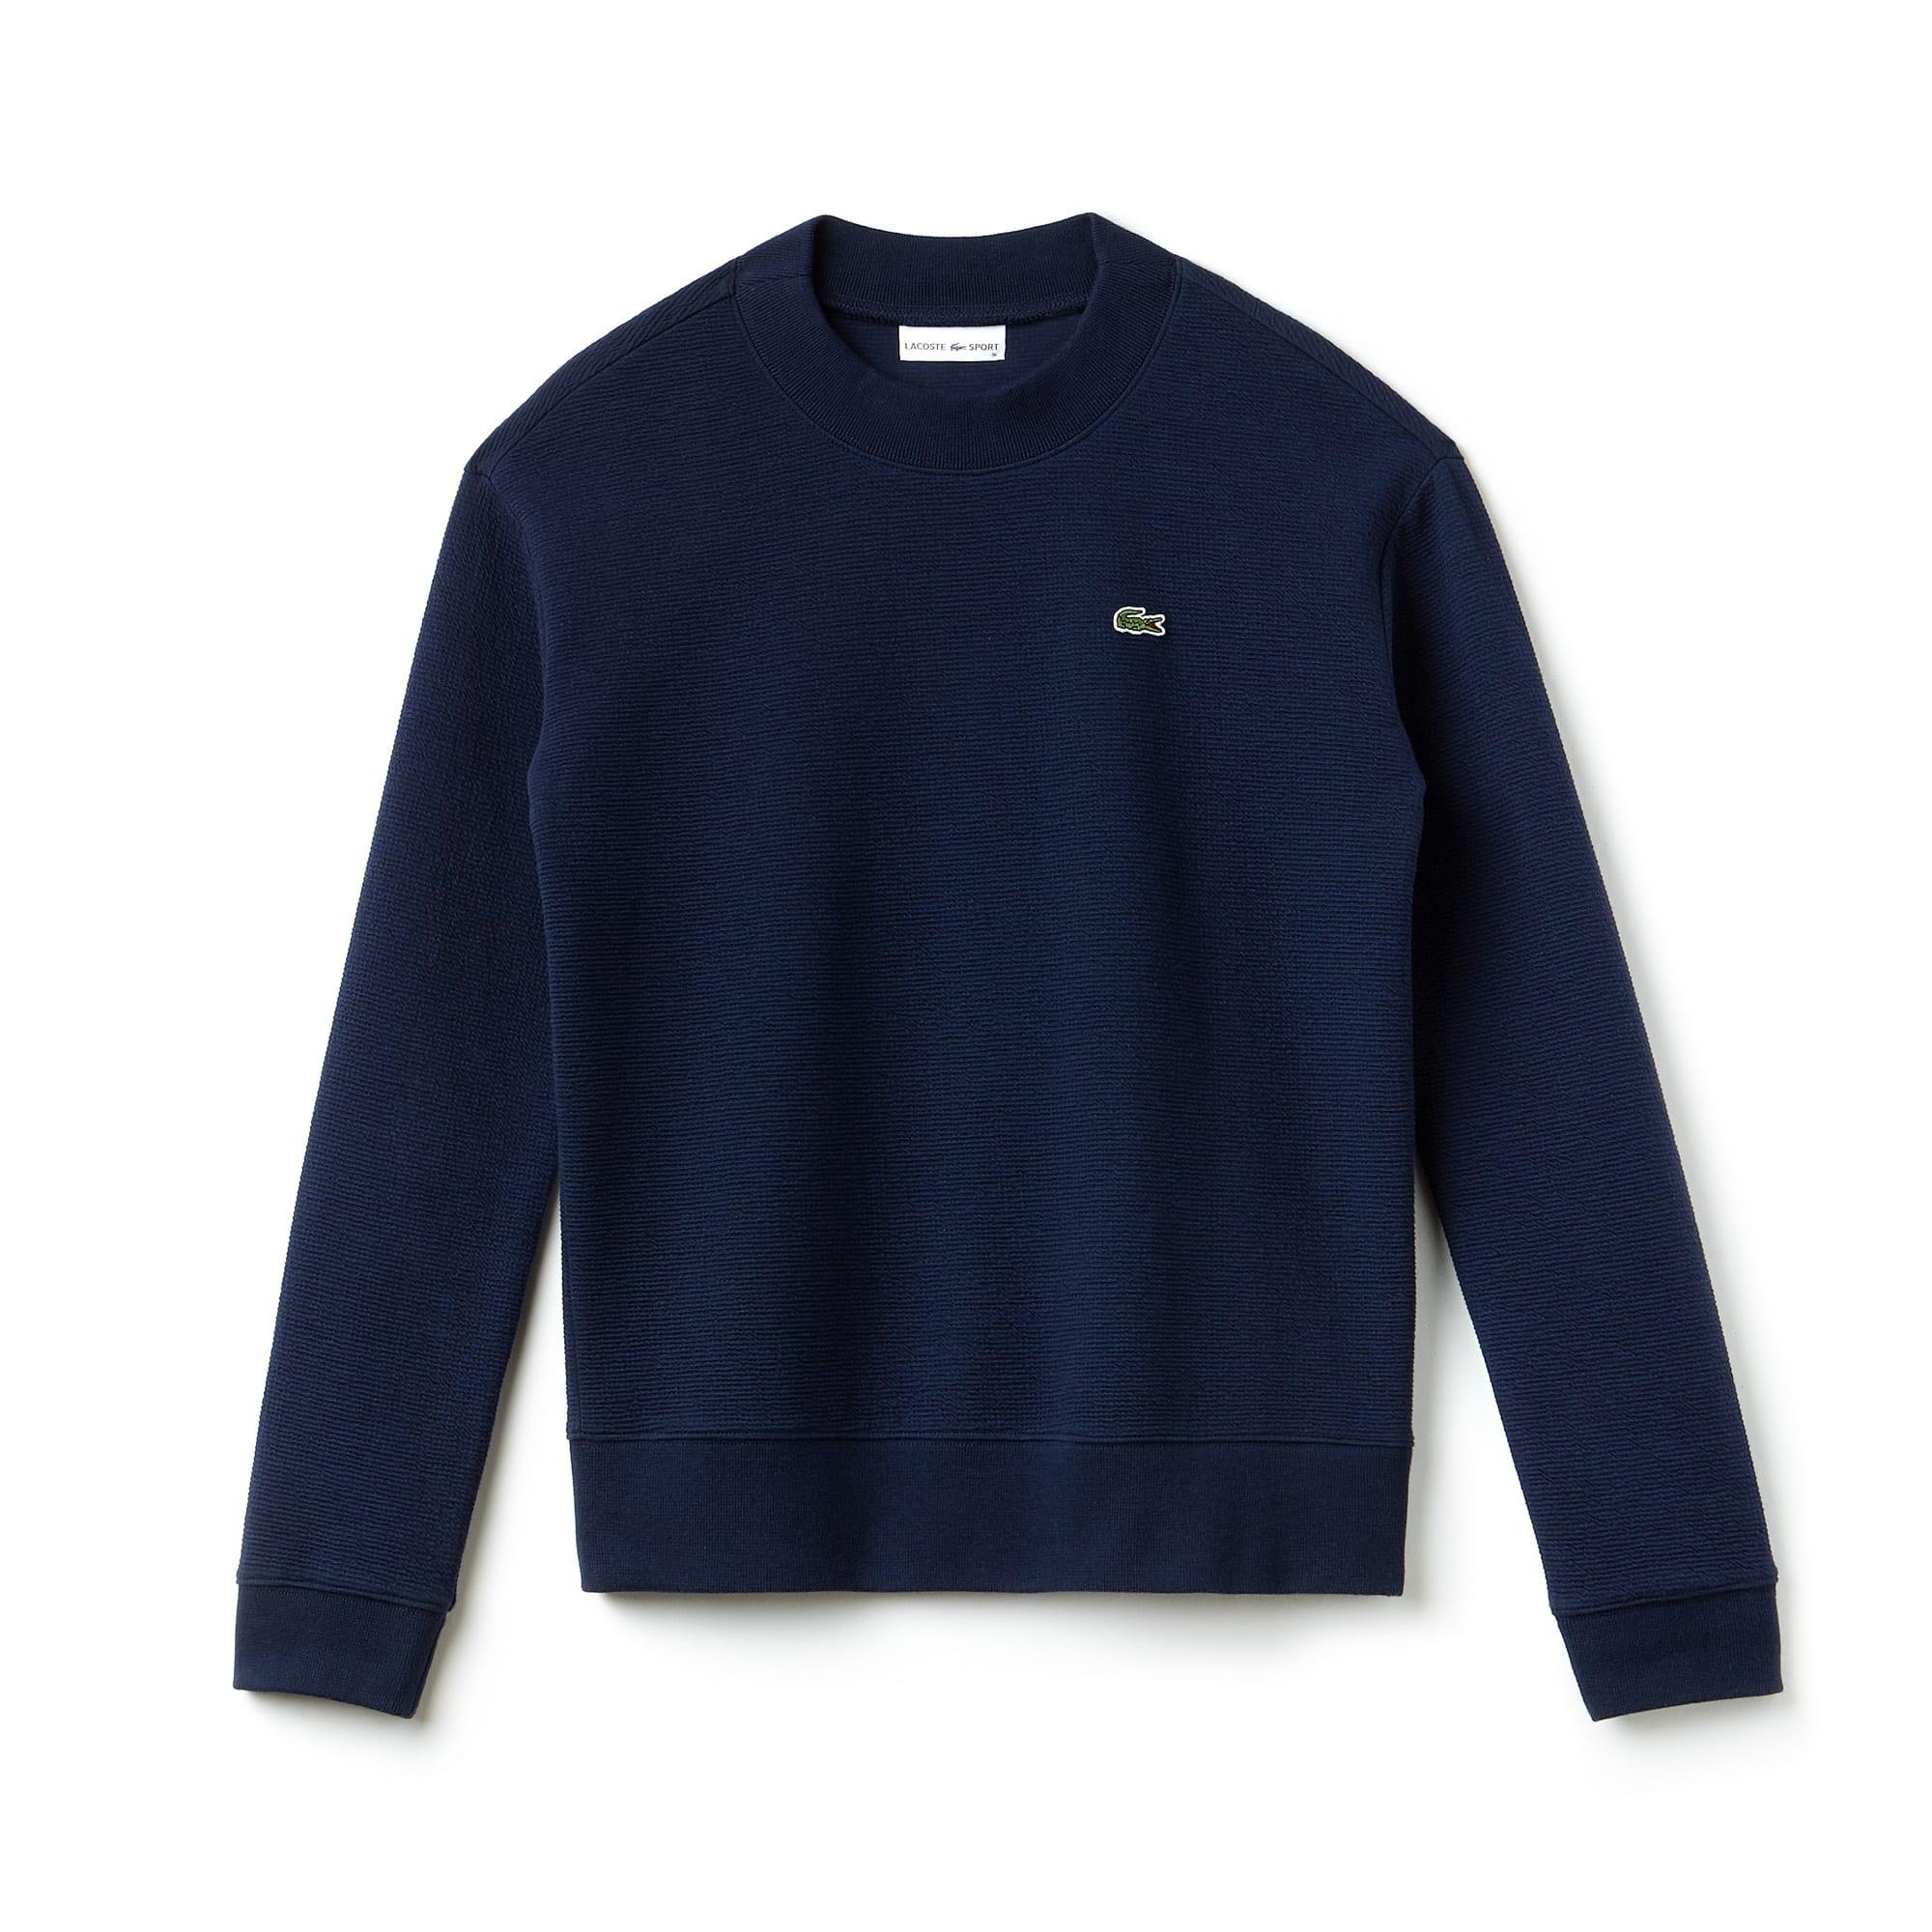 Sweatshirt Tennis Lacoste SPORT en molleton gaufré uni